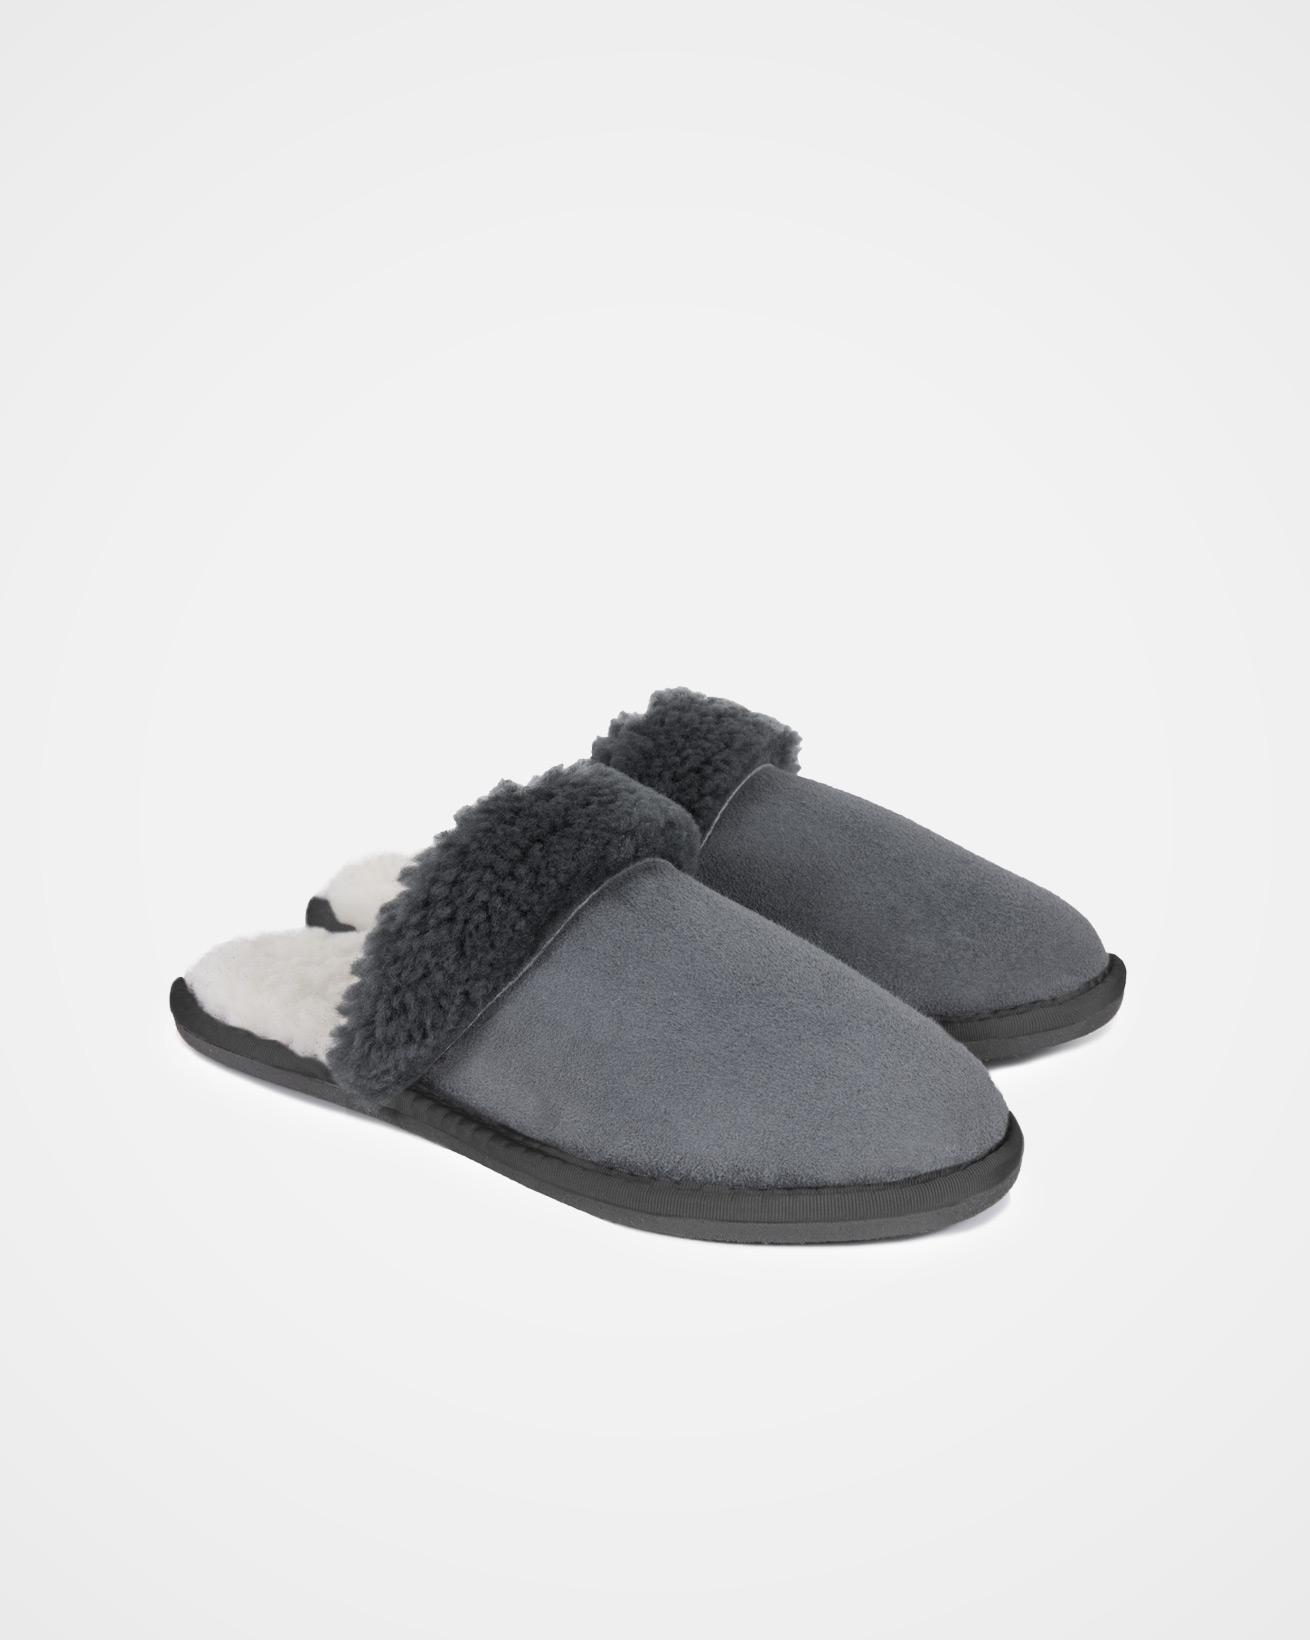 Ladies Turnback Mules - Size 5 - Dark Grey - 2075